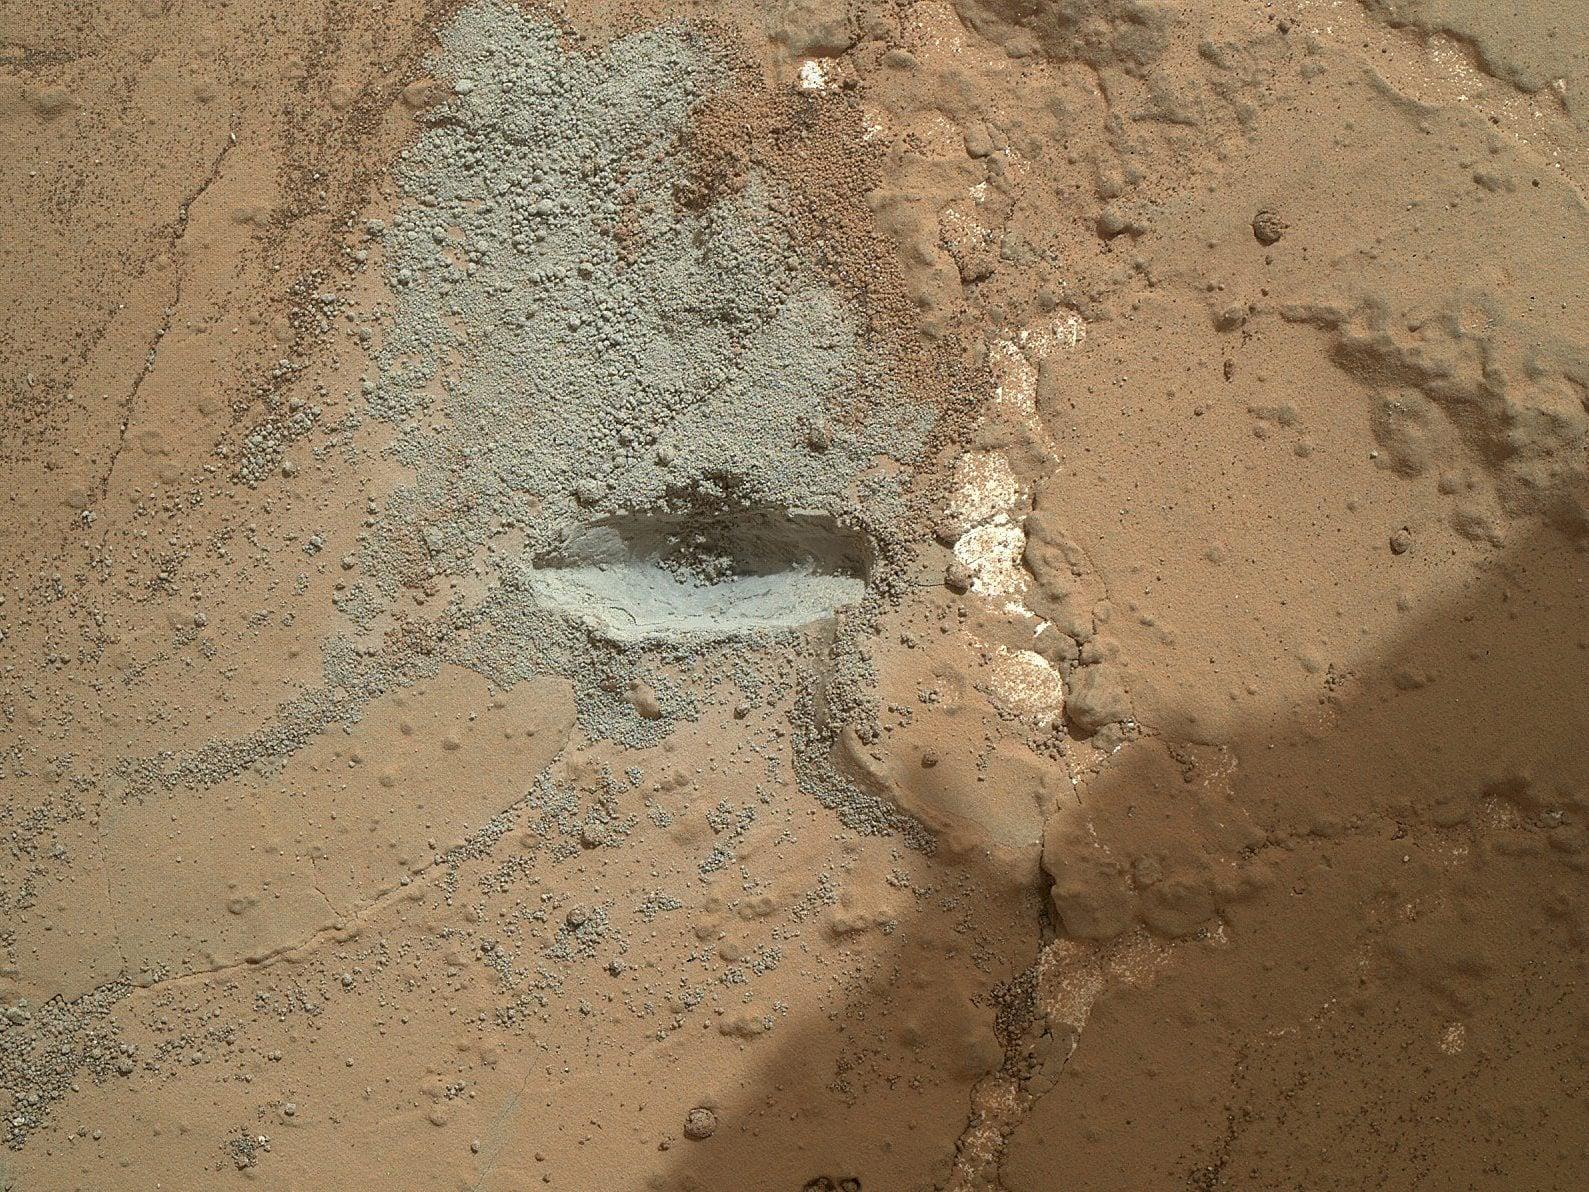 Mars probe Curiosity Drilling activities